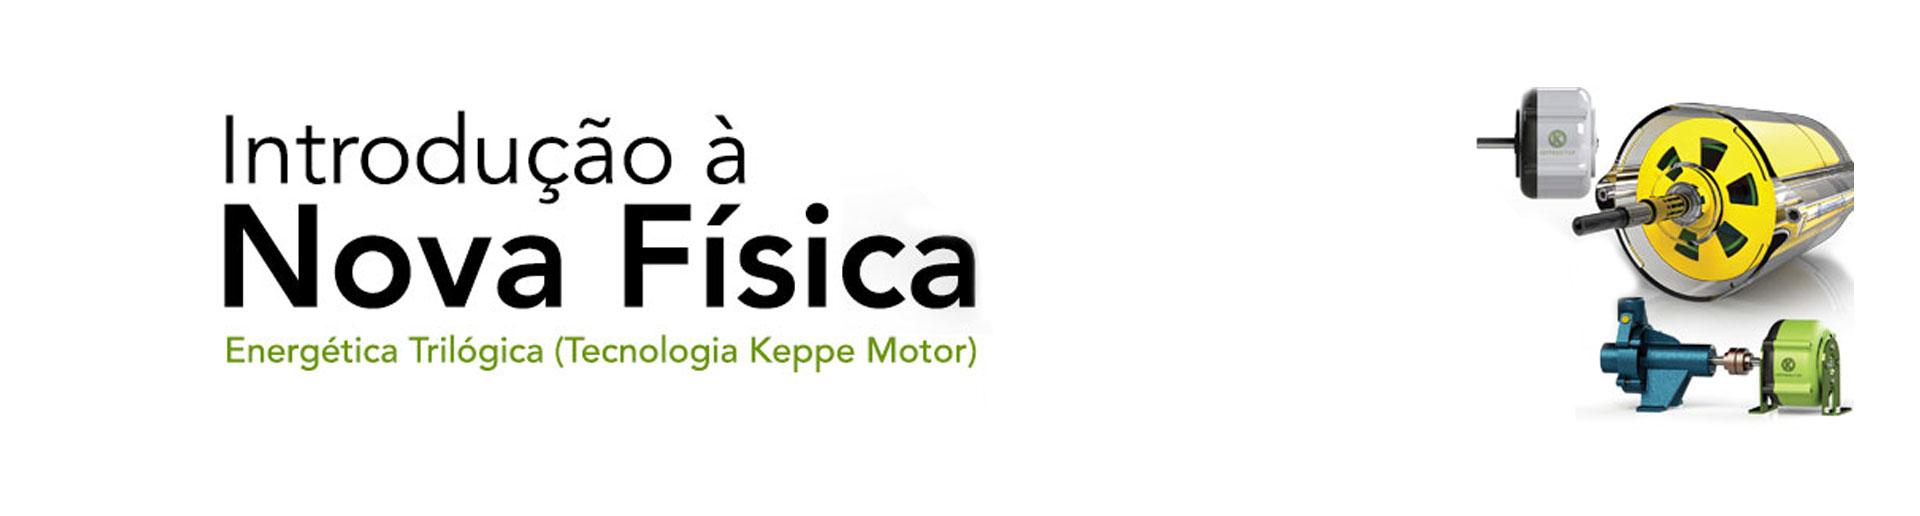 banner-site-curso-nova-fisica-2016